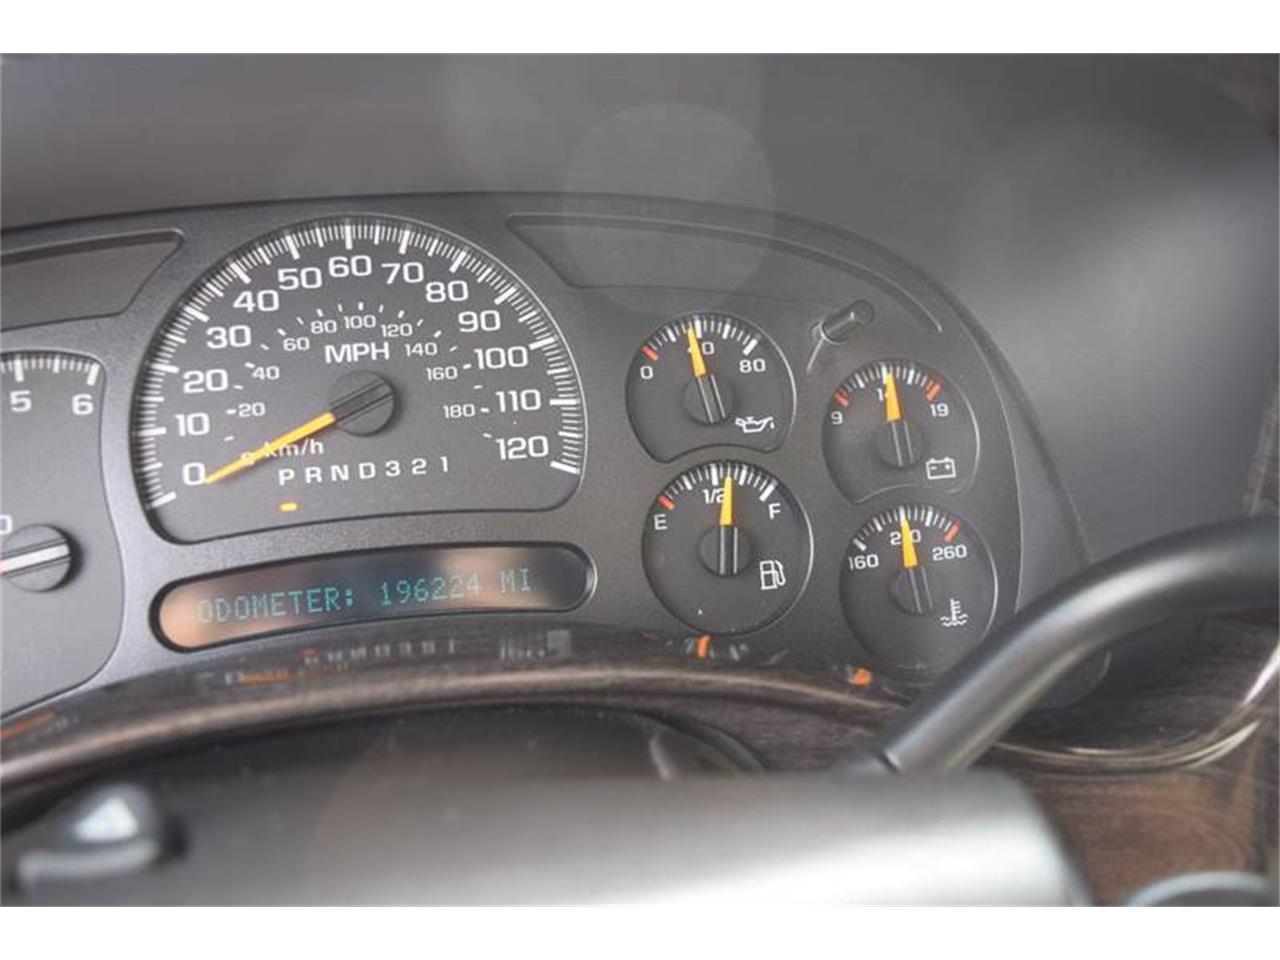 2006 GMC Sierra 1500 (CC-1234632) for sale in Biloxi, Mississippi